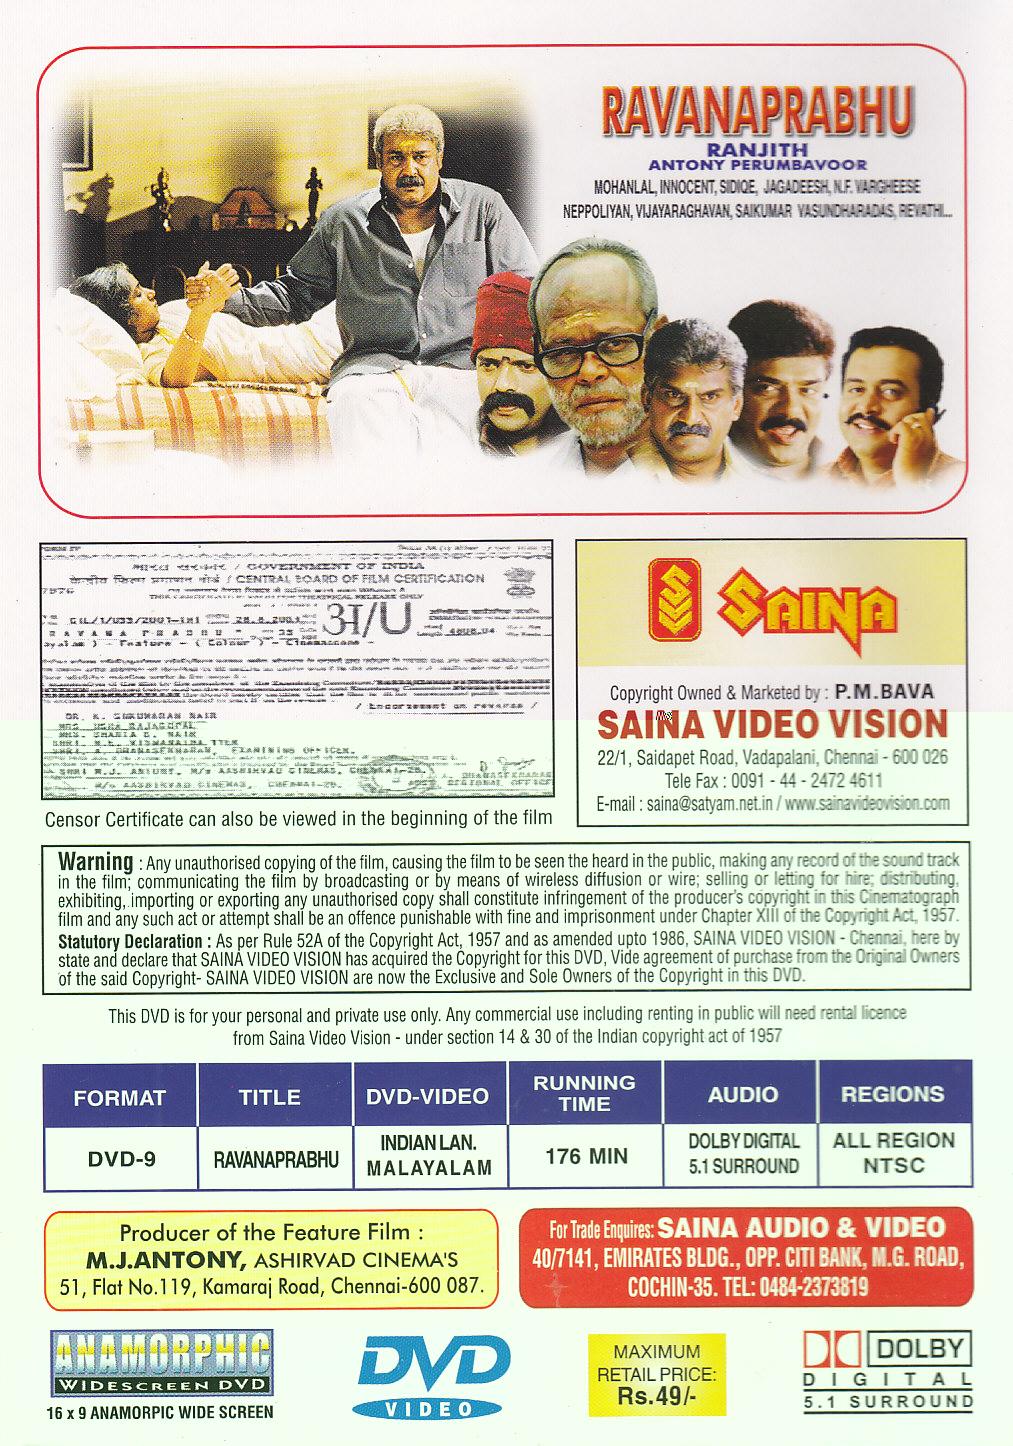 Raavanaprabhu Saina DVD Covers & Screenshots Ravanaprabhu_B